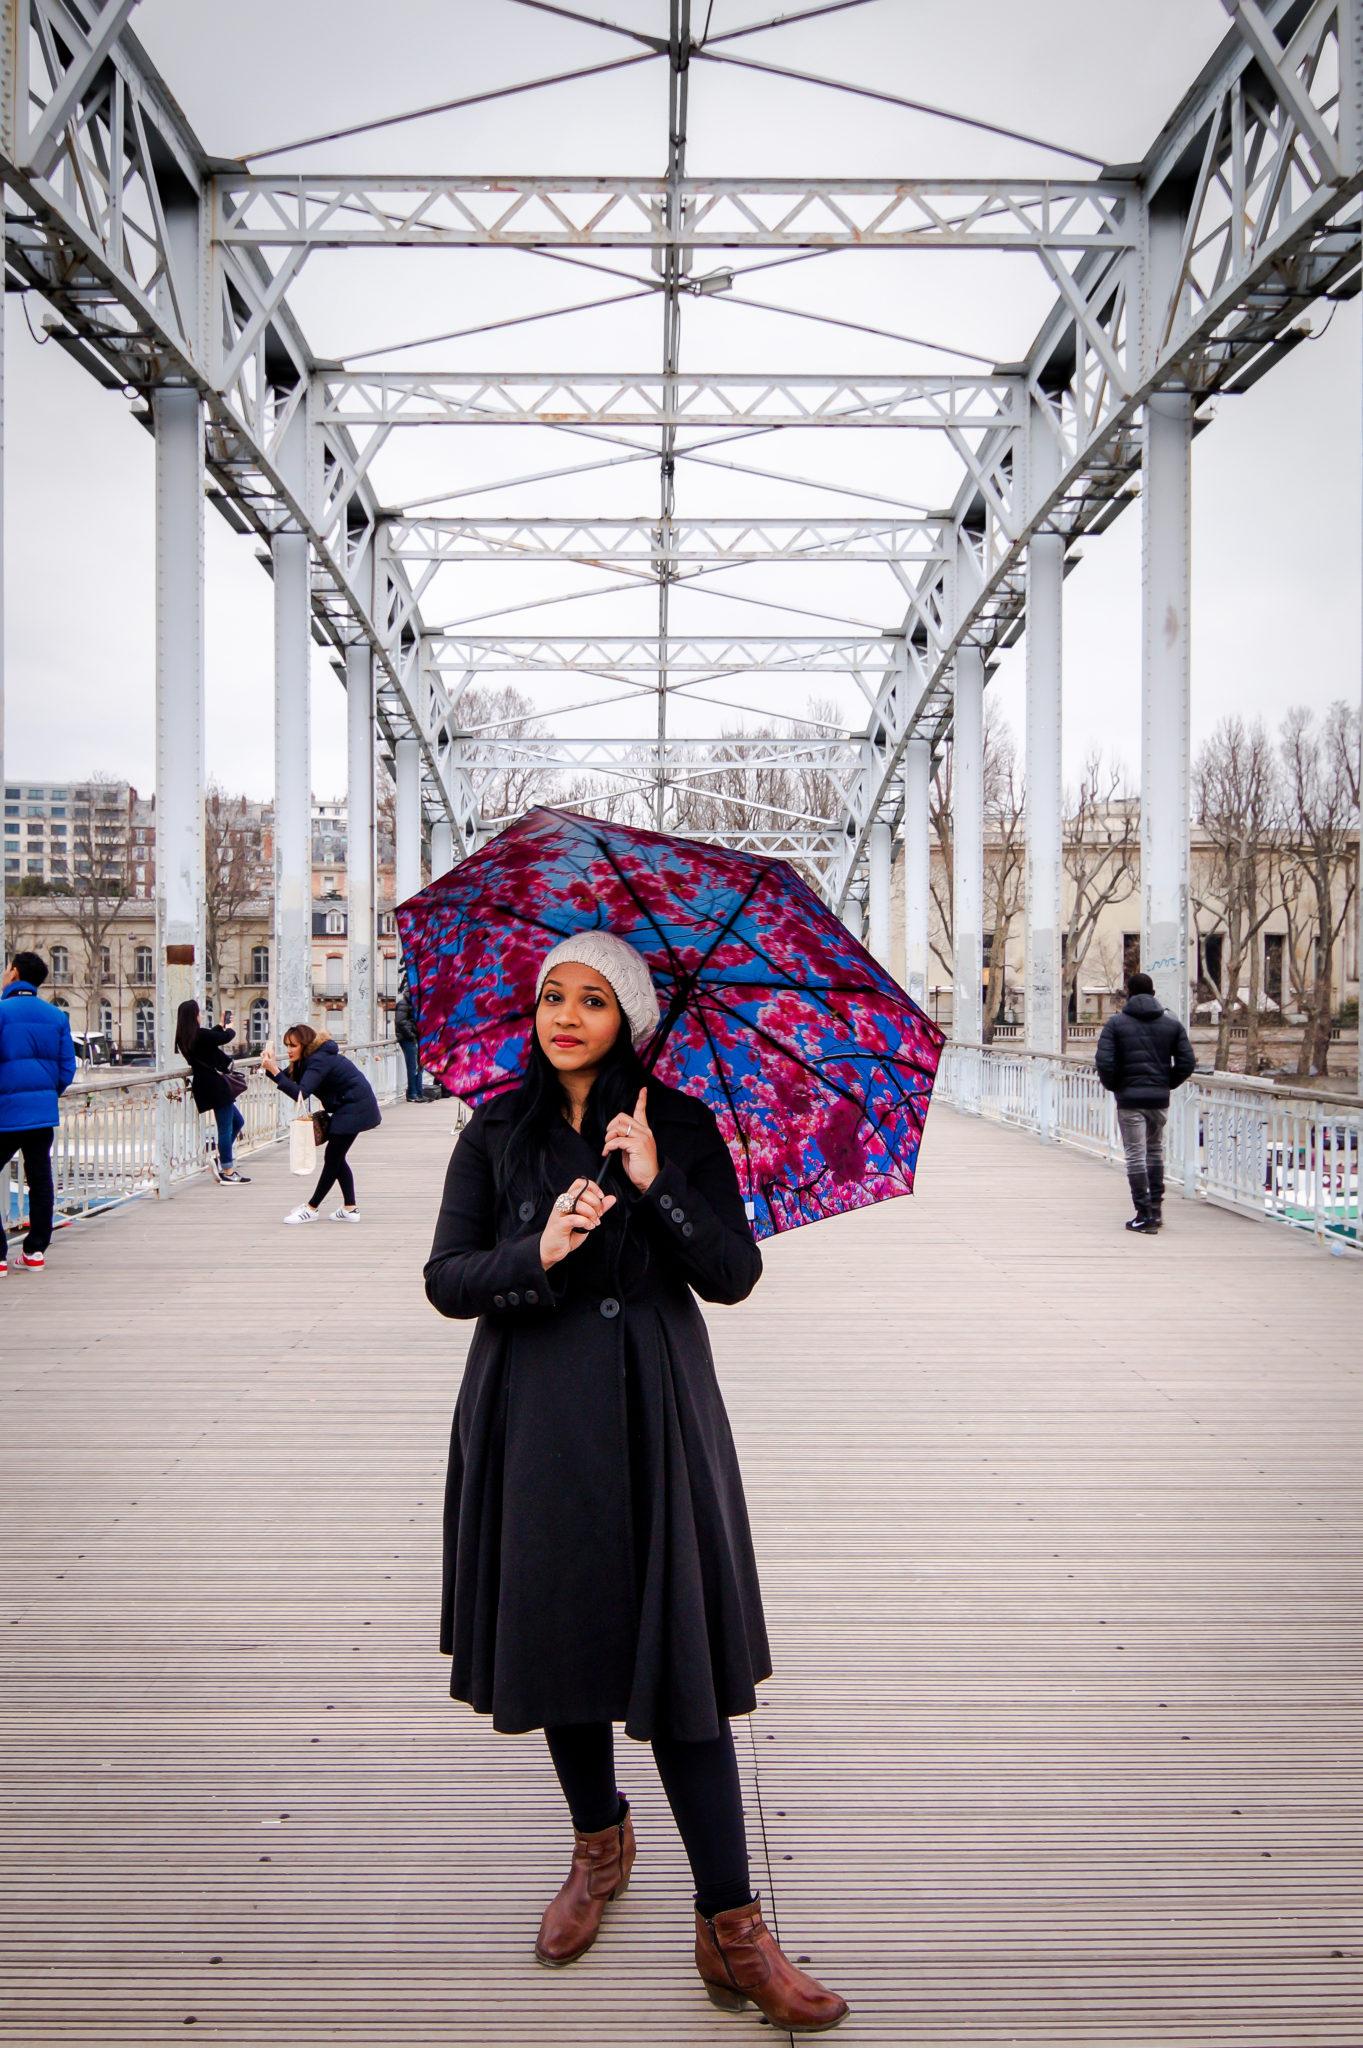 Hemaposesesvalises_Happysweeds_Cherry_Umbrella_passage_debilly_winter_paris_blog_mode